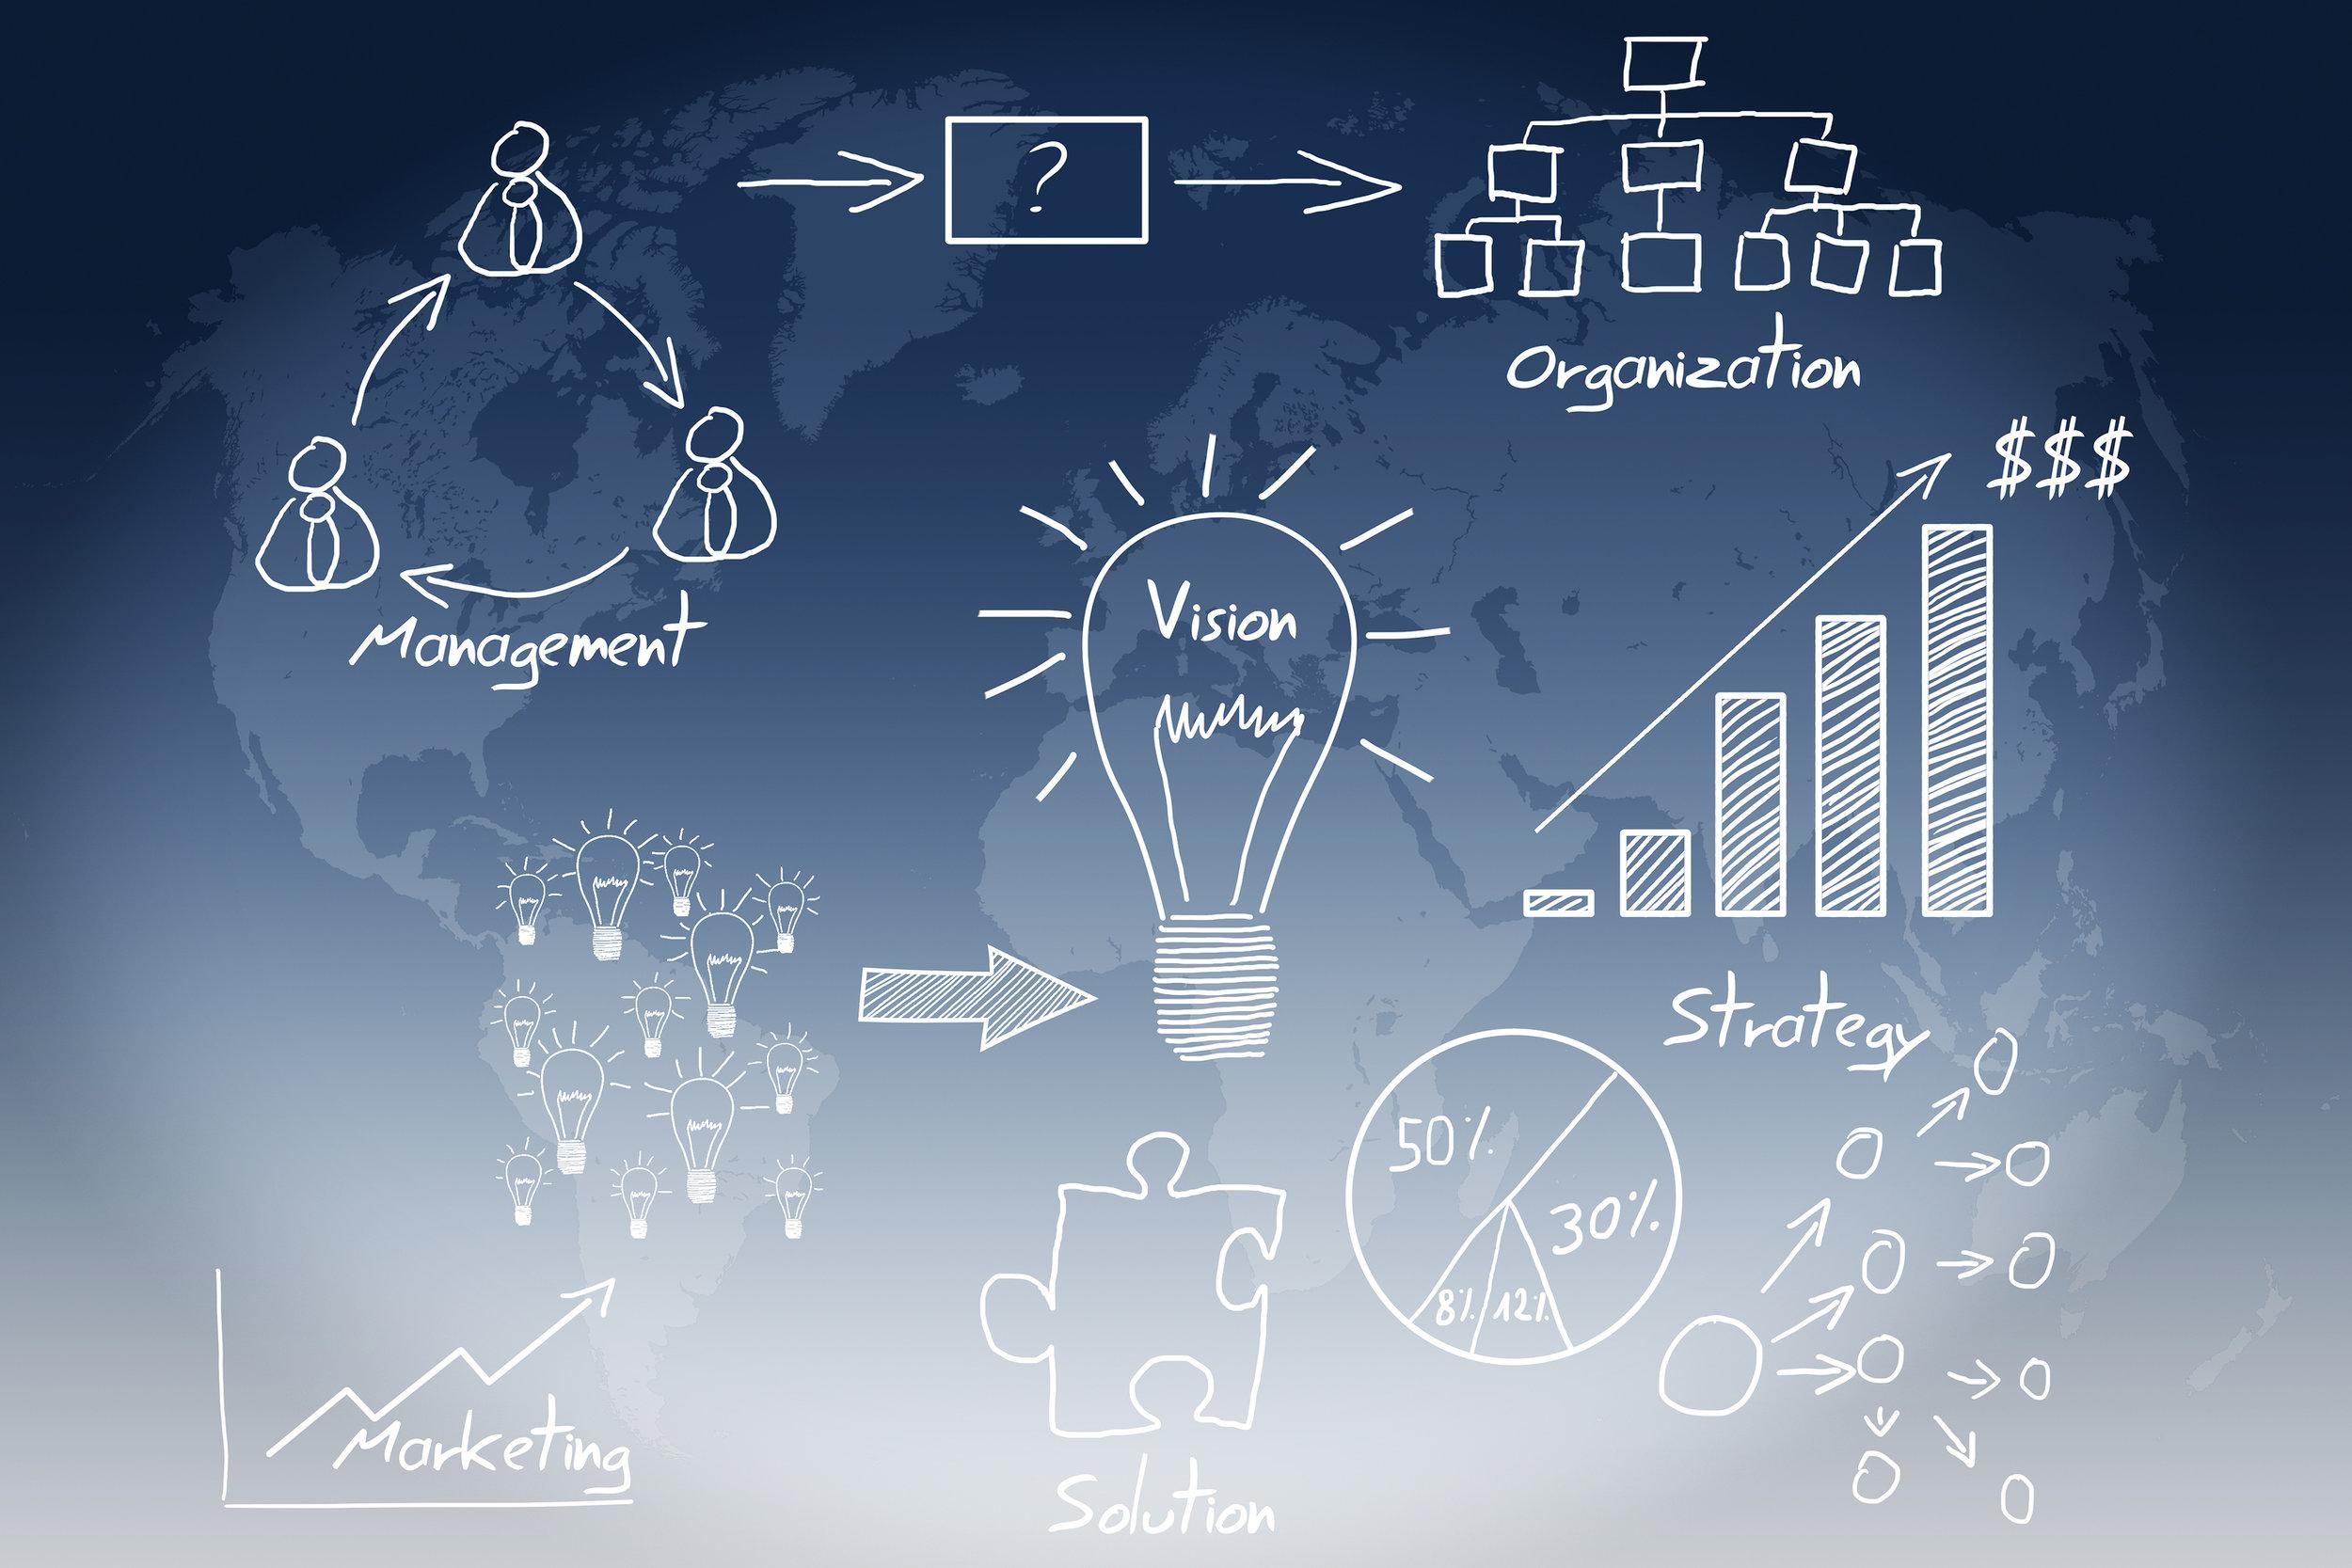 bigstock-Business-Idea-Concept-44475463.jpg